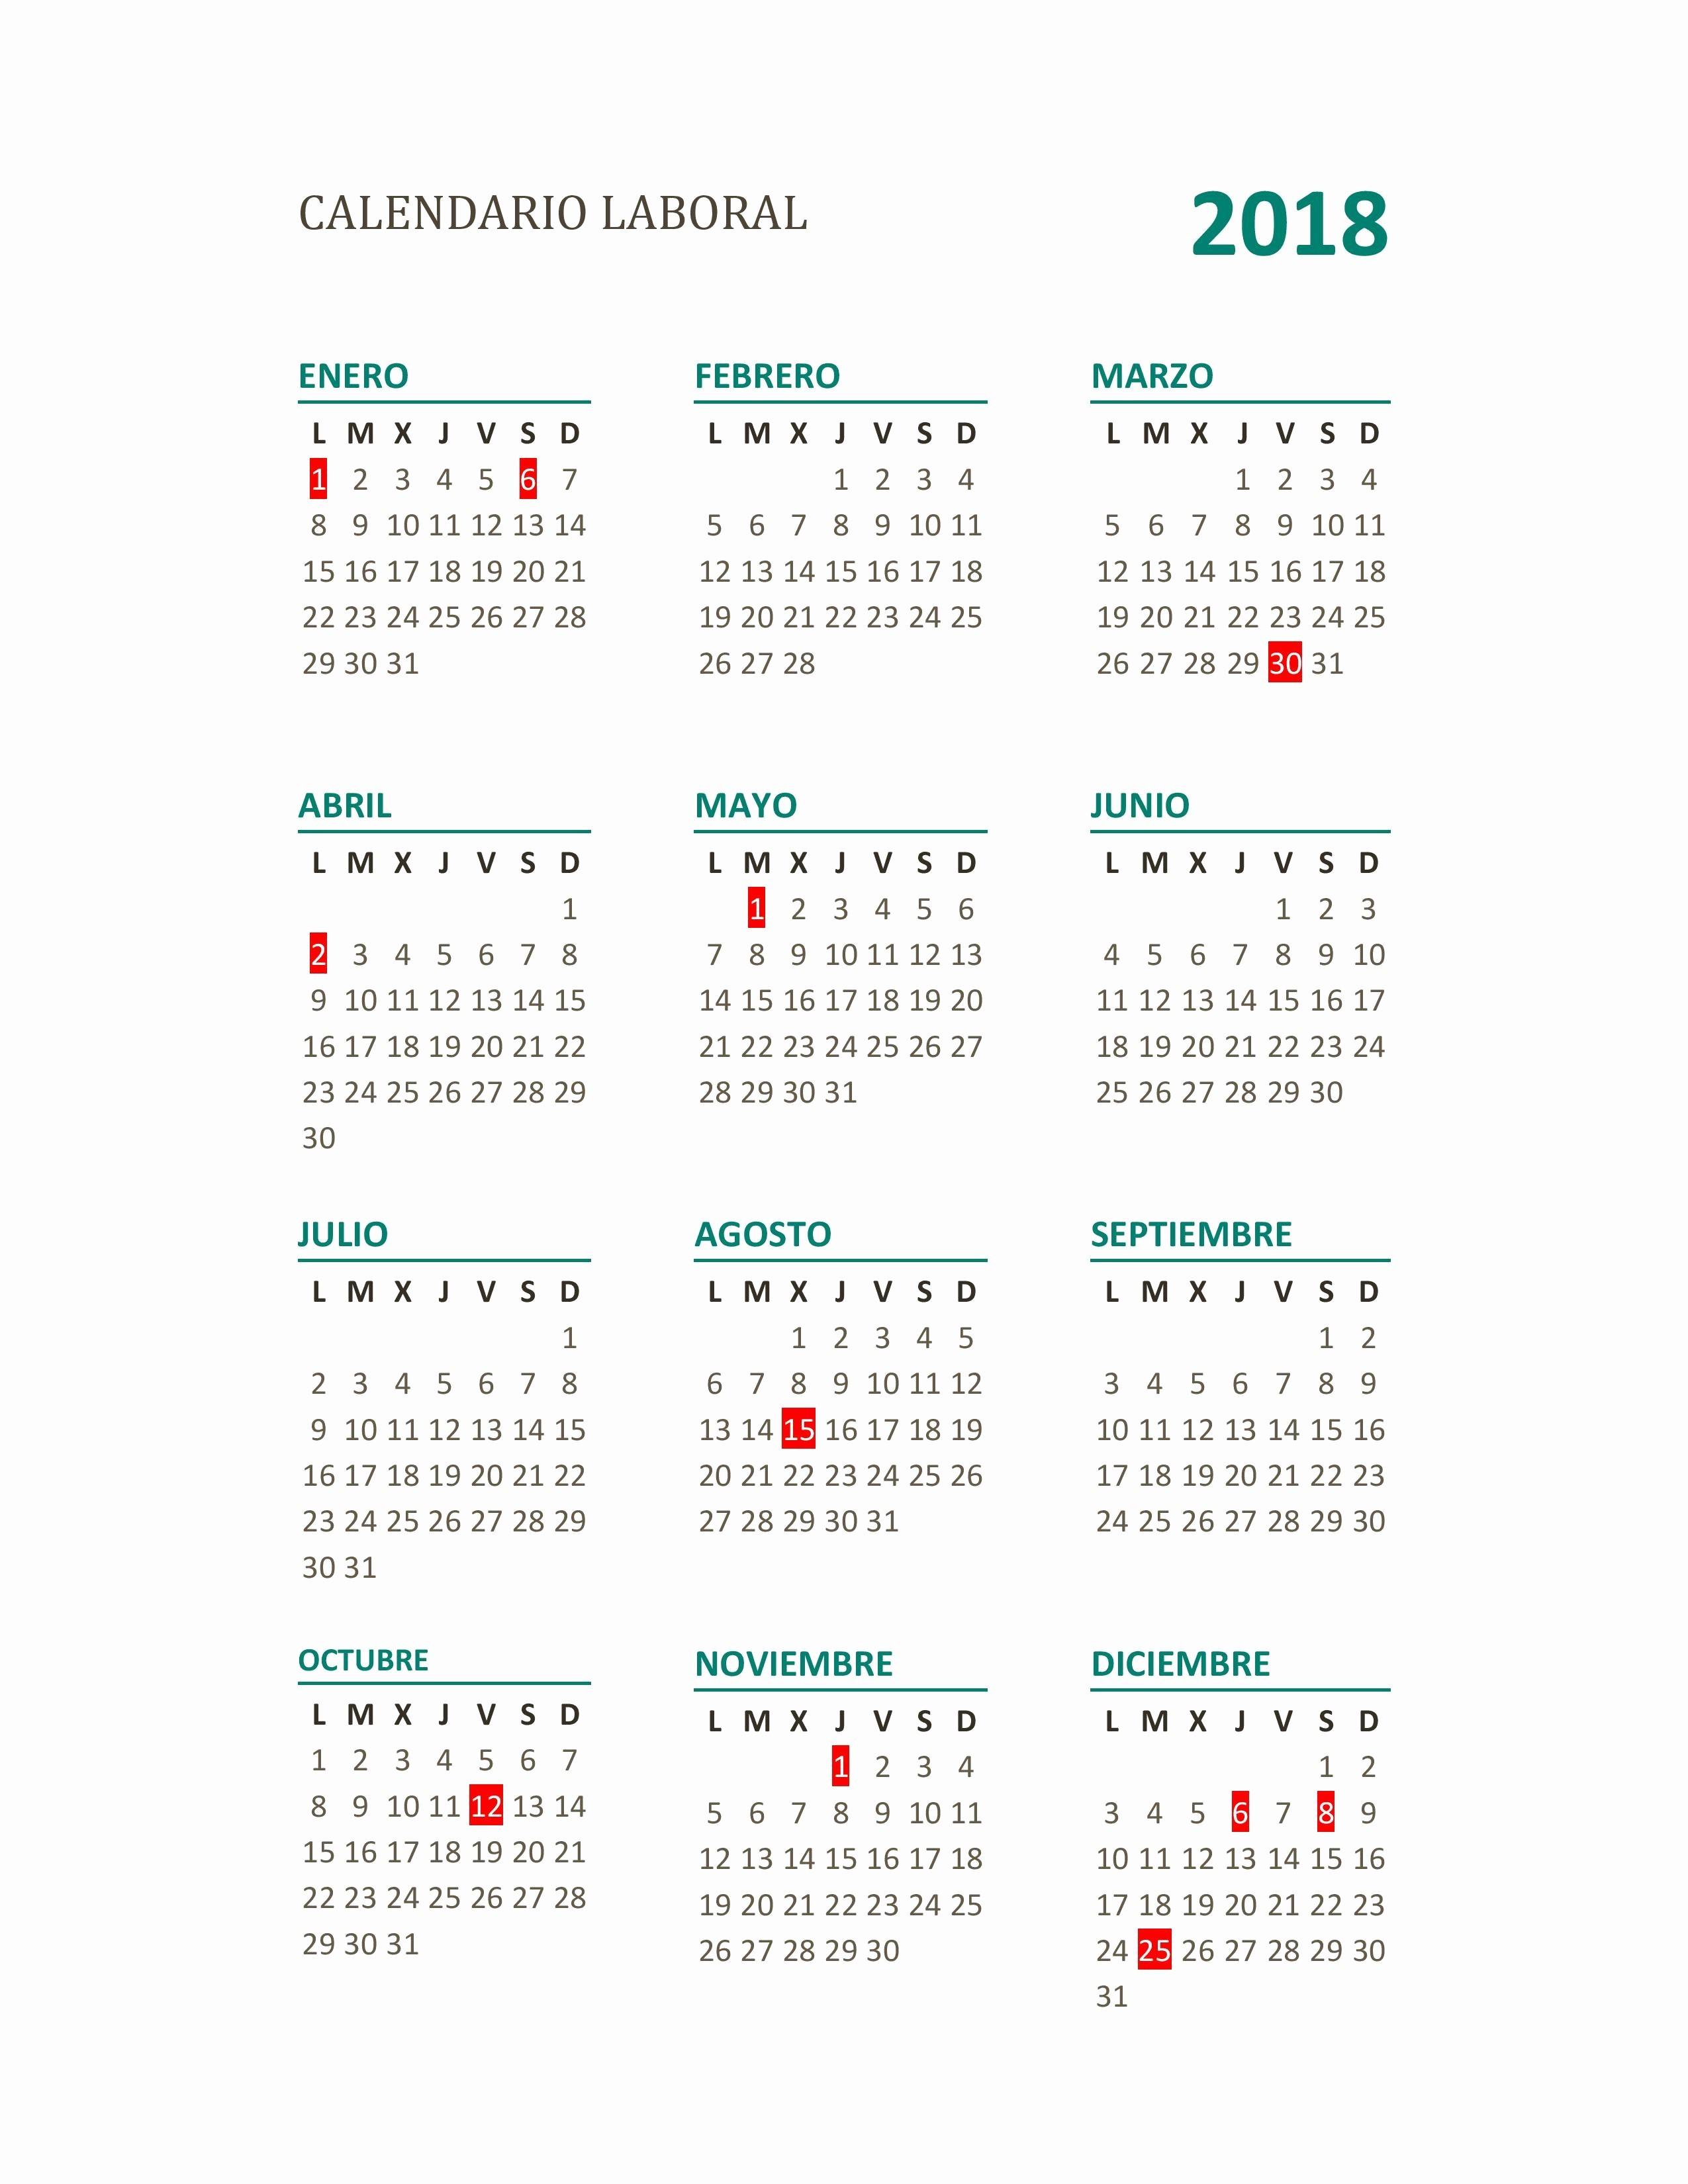 Calendario De Mexico 2019 Dias Feriados Más Caliente Prueba Calendario 2019 Dias Festivos